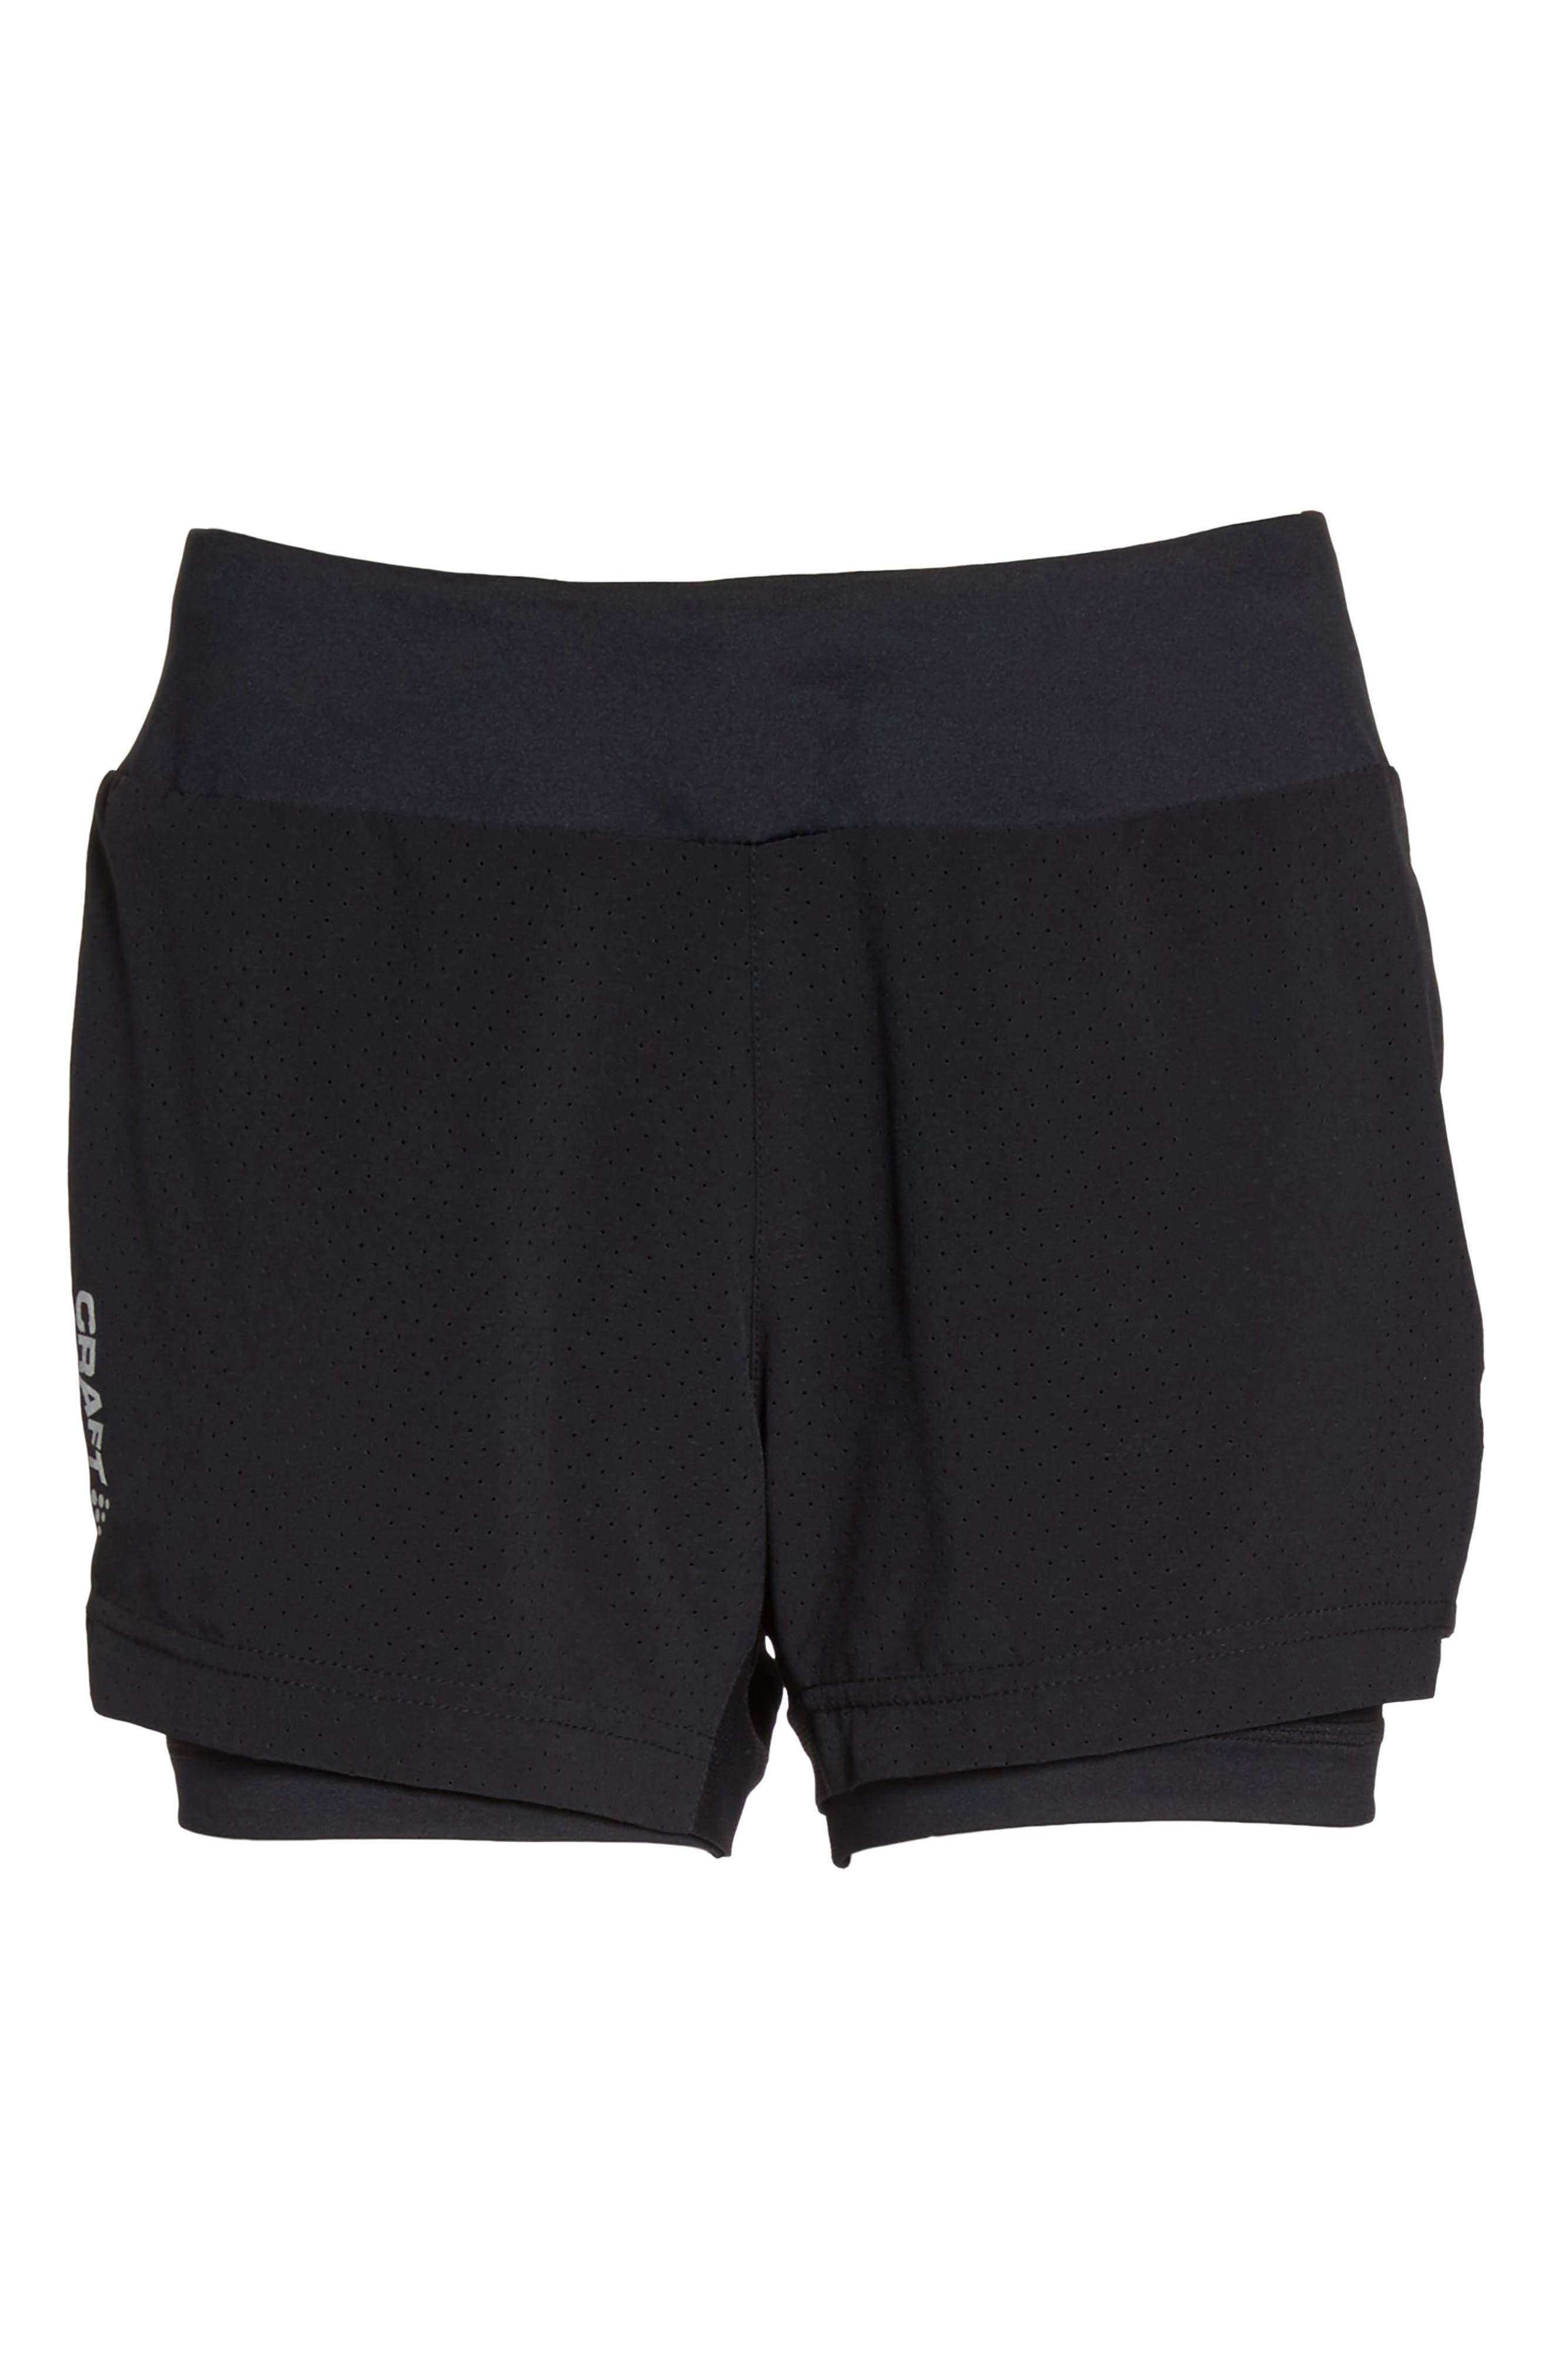 Breakaway 2-in-1 Shorts,                             Alternate thumbnail 7, color,                             001